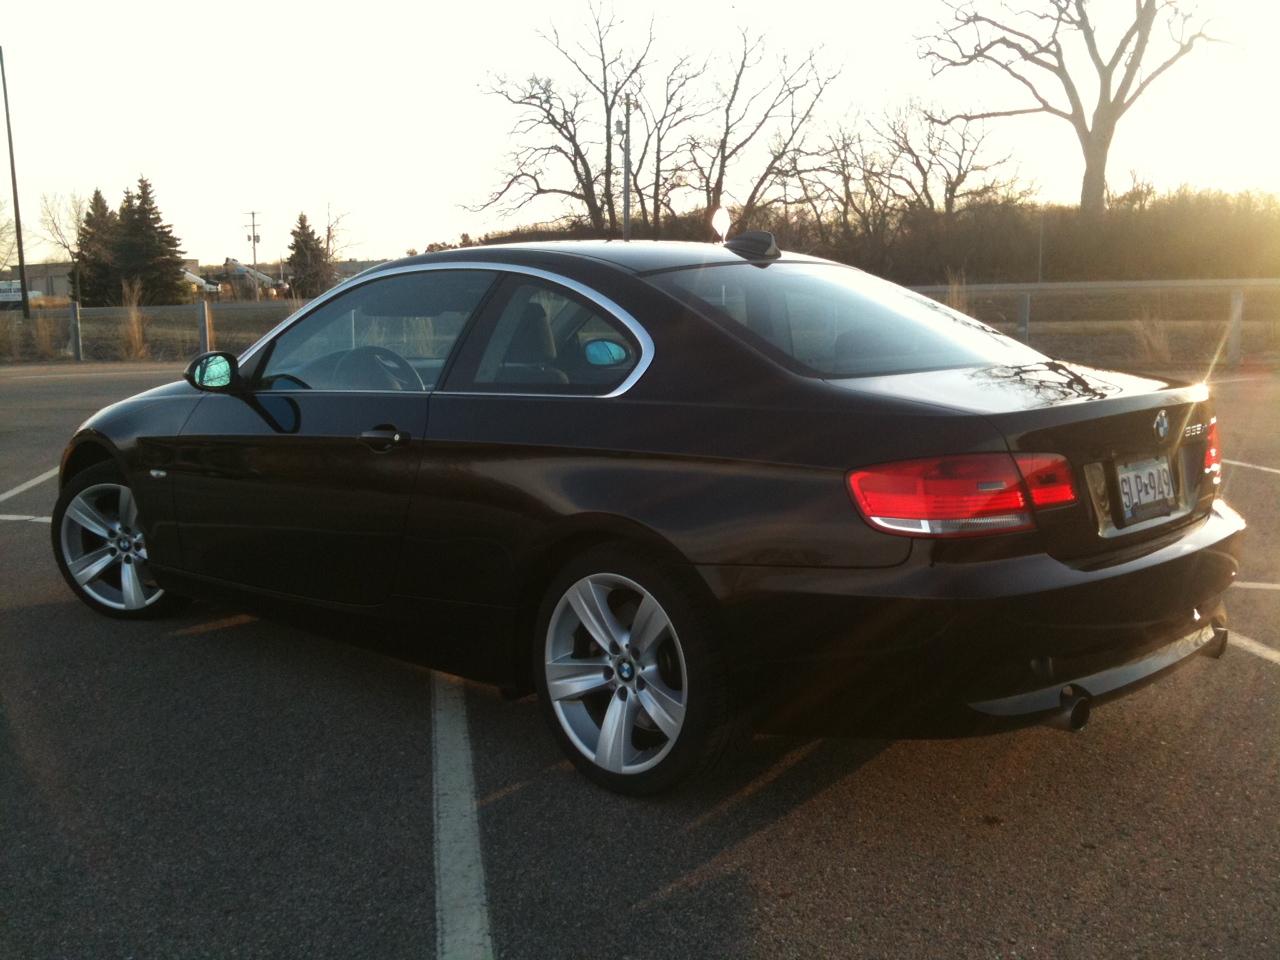 FS: 2008 BMW 335xi E92 6MT Blk/Blk 43.5M